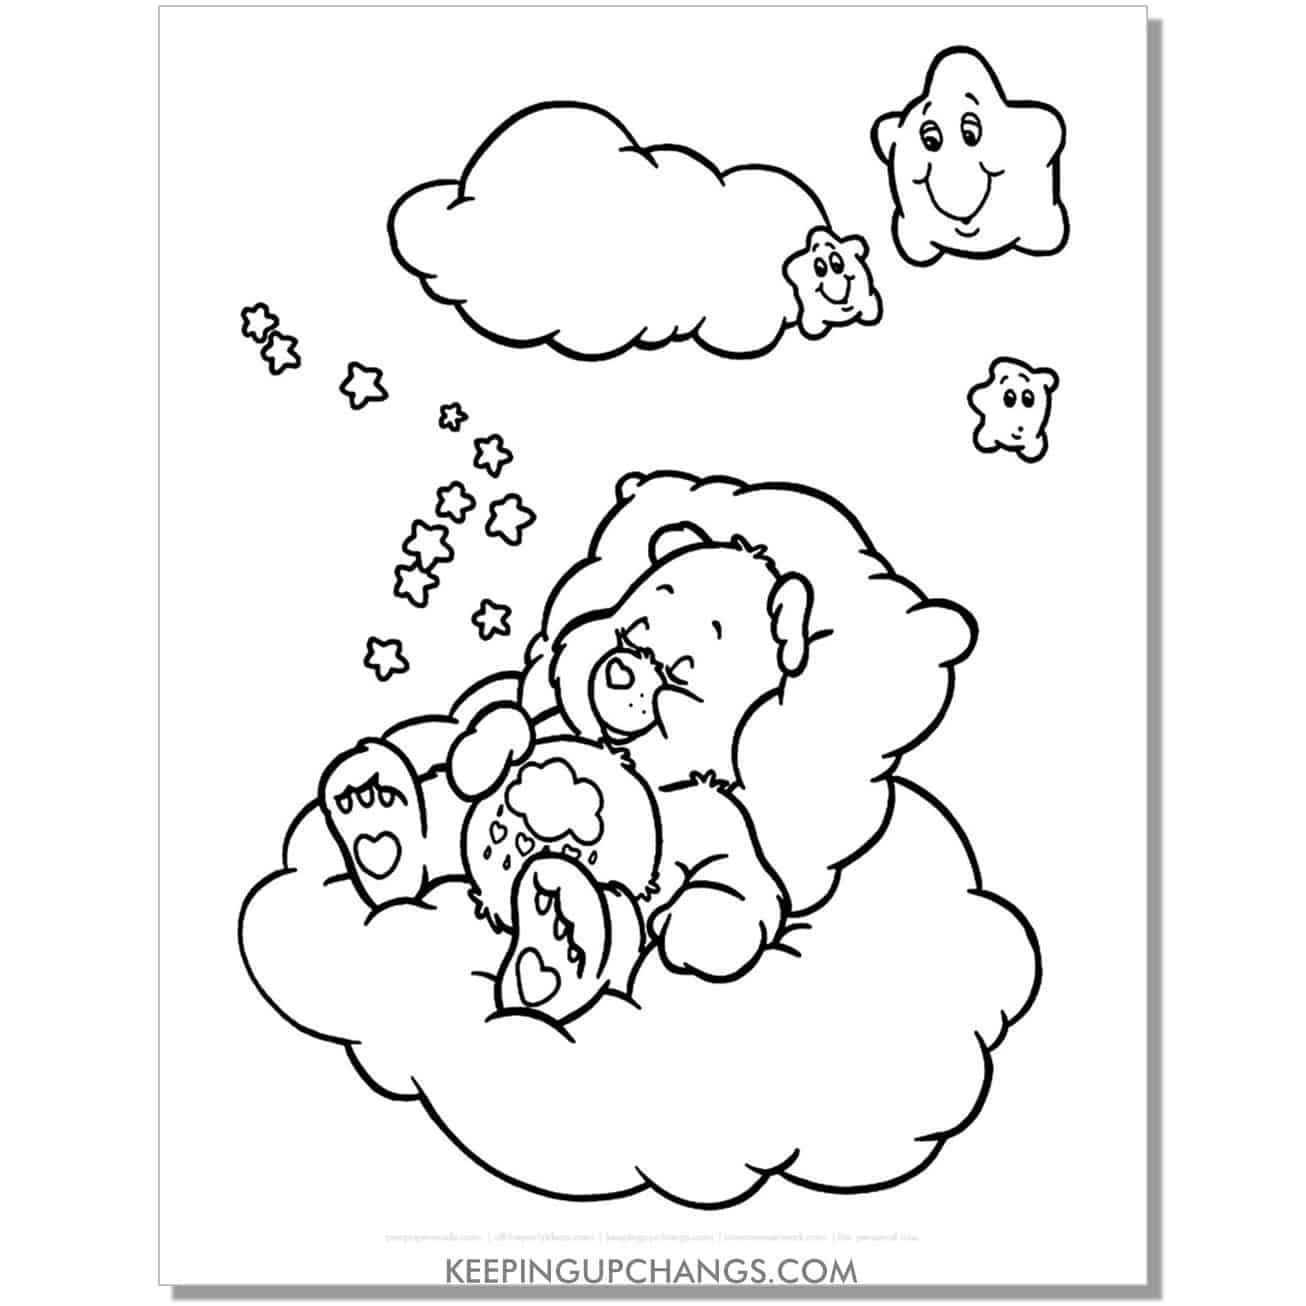 gloomy care bear coloring page drifting off to sleep.